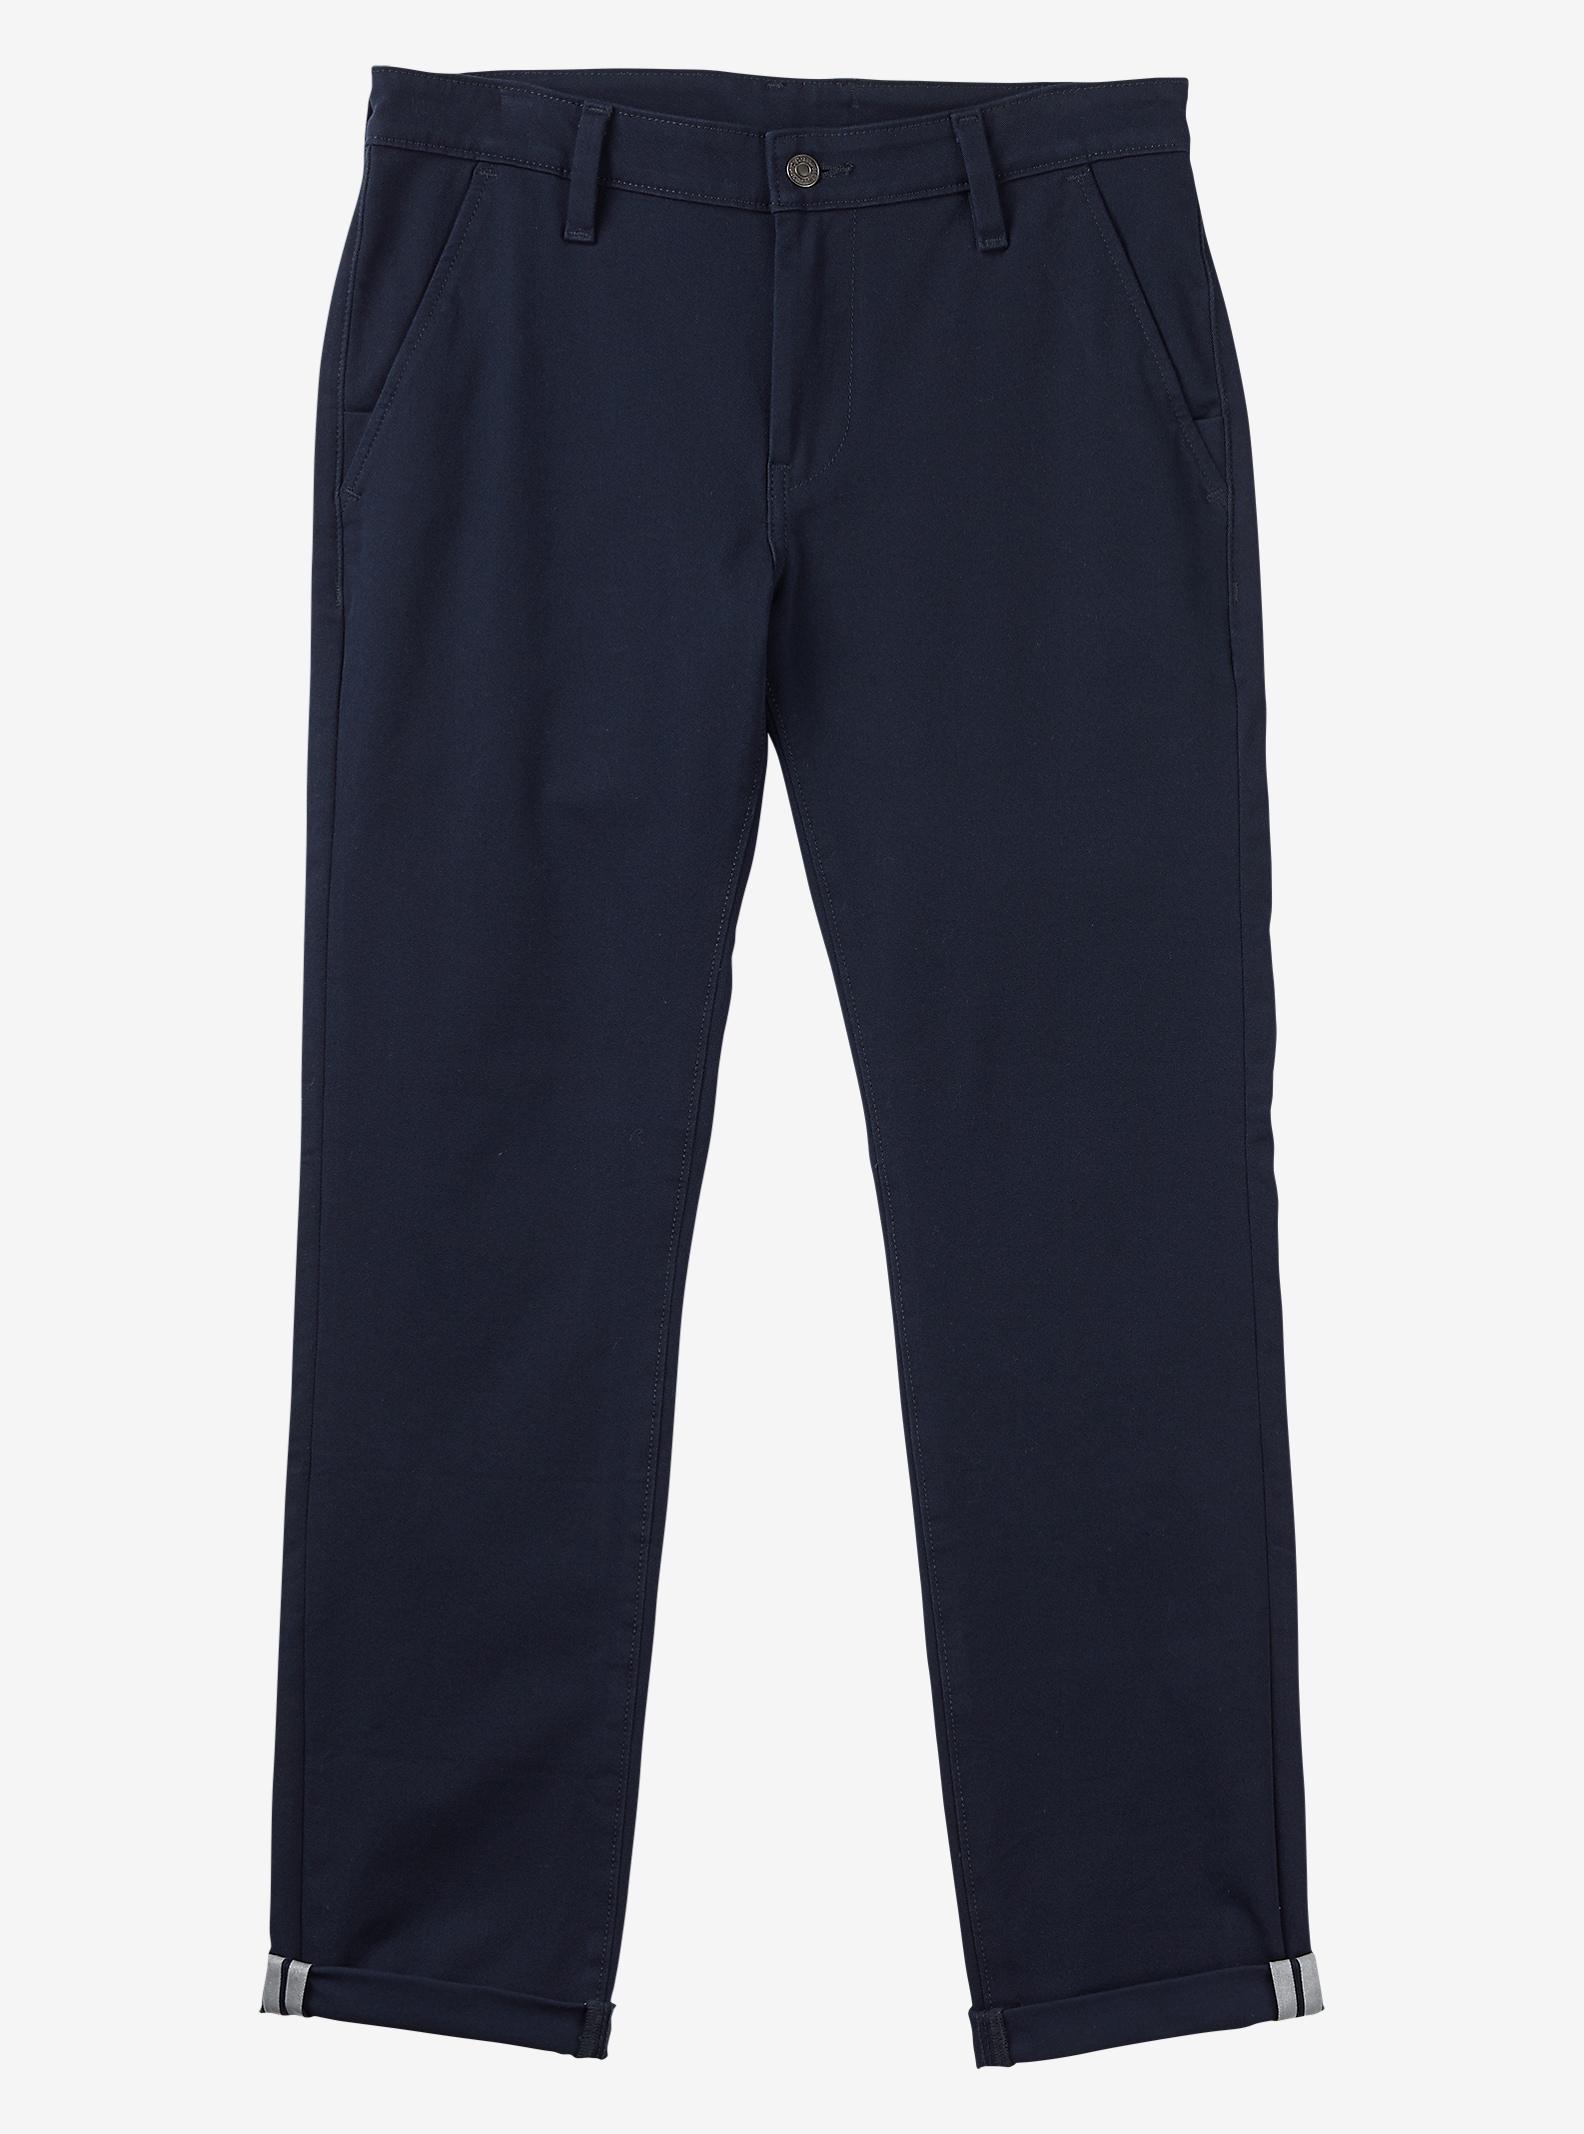 Levi's® Commuter™ 511™ Slim Fit Pant shown in Blue